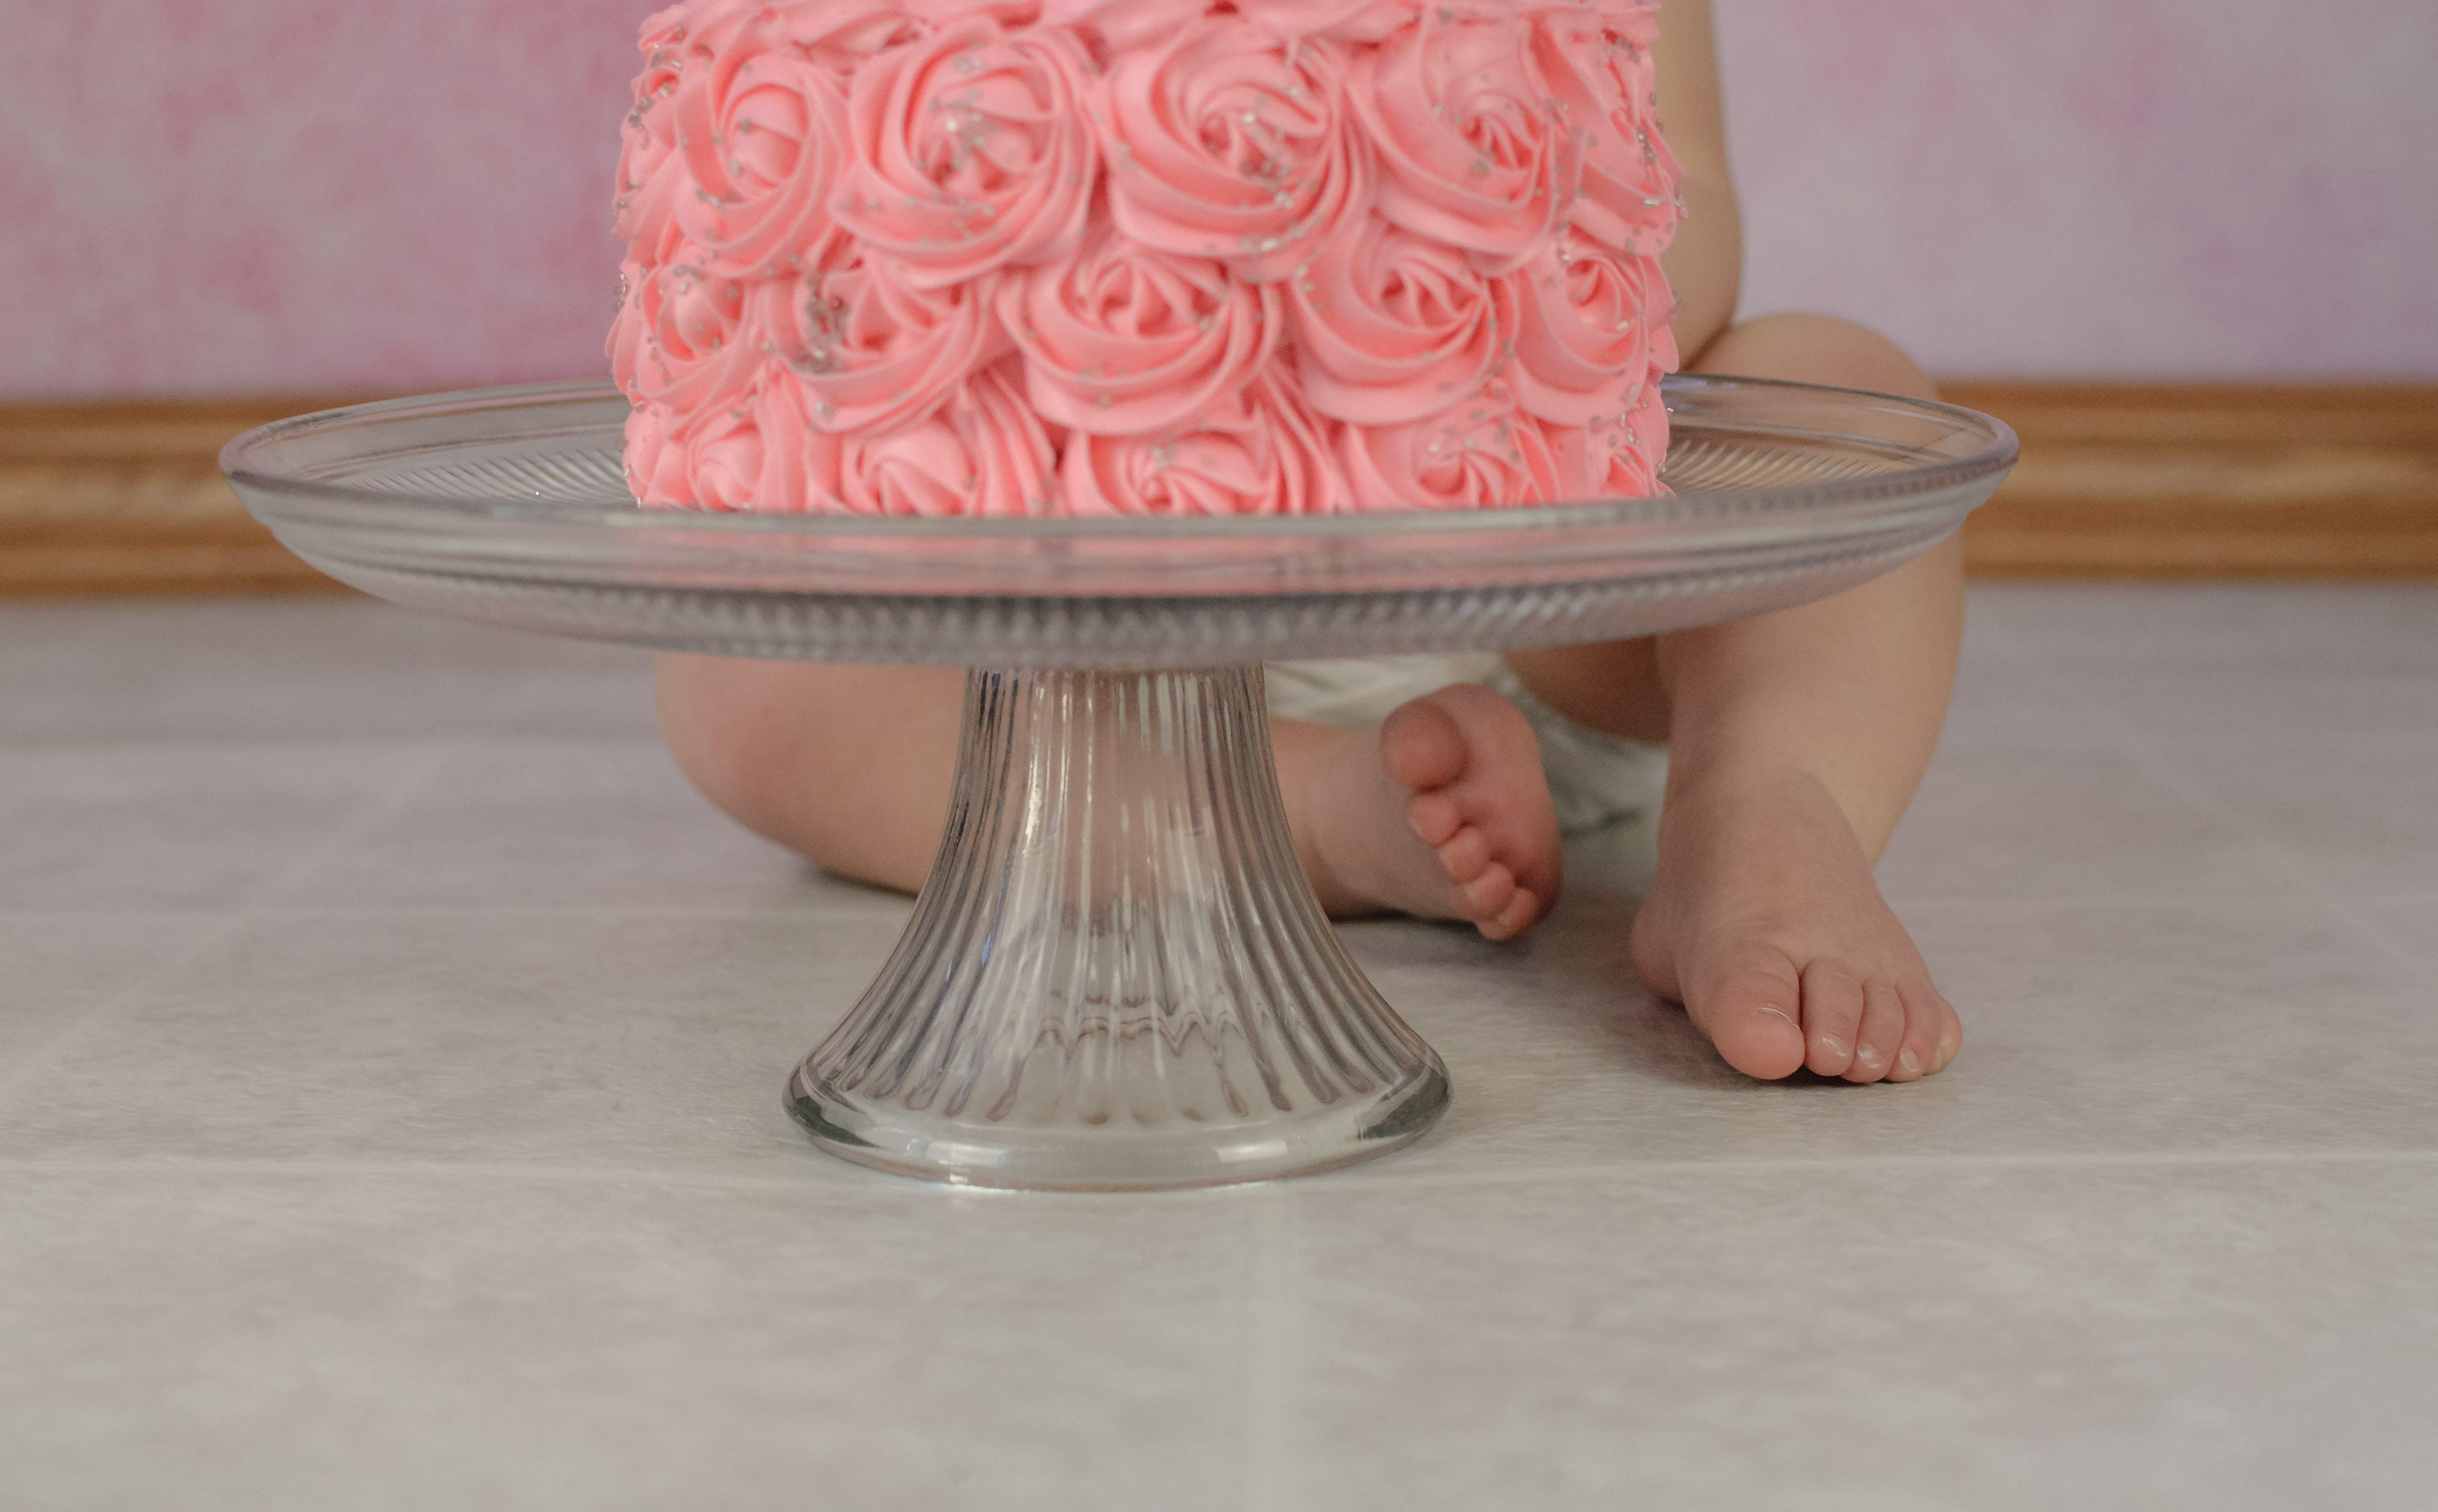 Free stock photo of baby, cake, cake smash, pink frosting